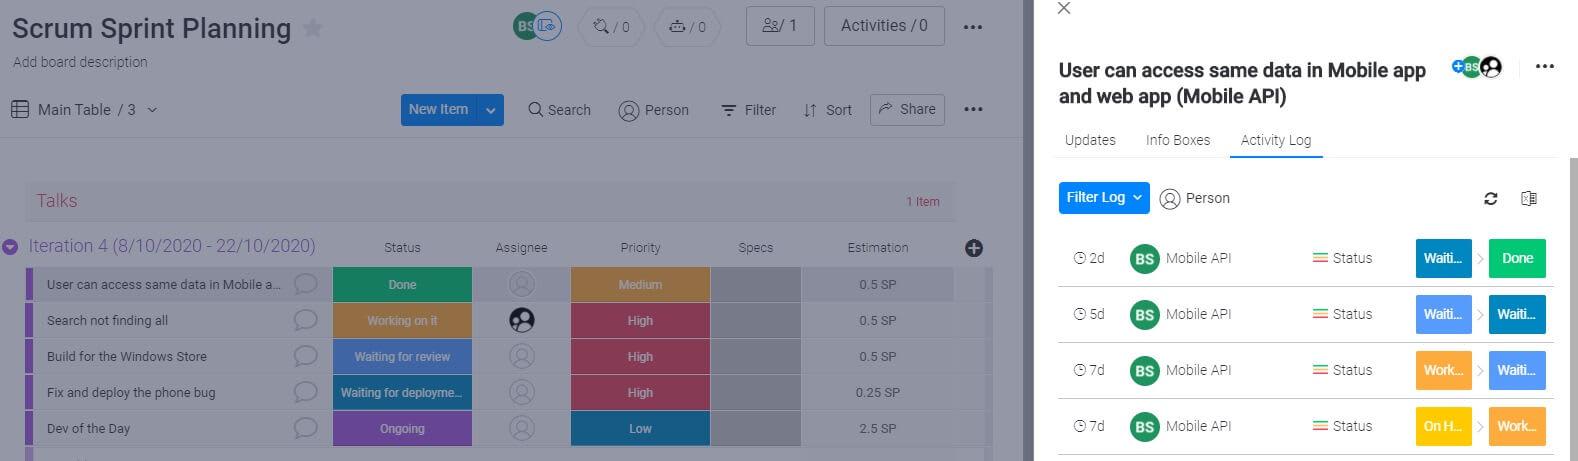 Screenshot of monday UI - Scrum Sprint activity log